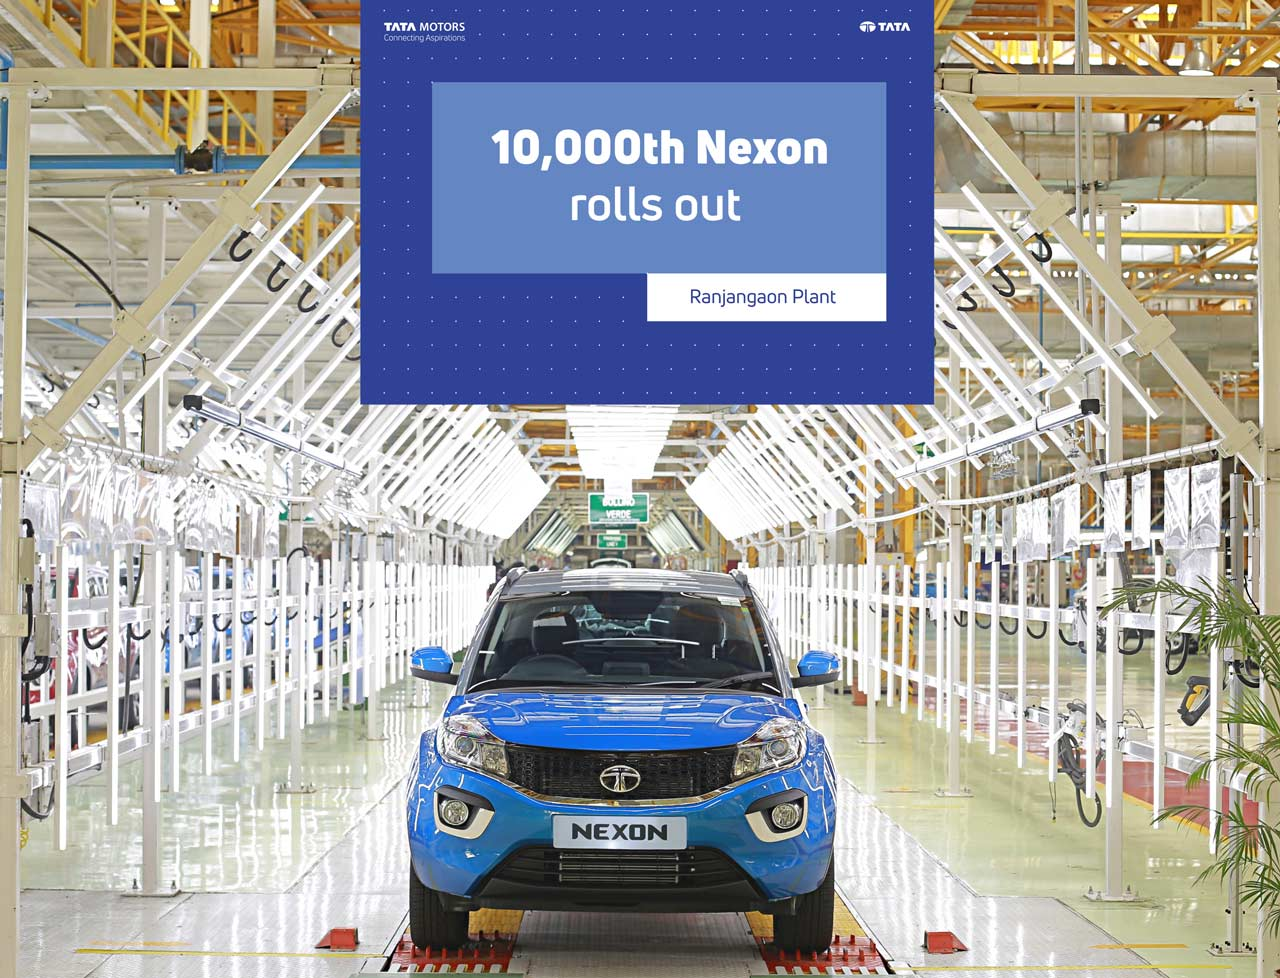 10,000th Tata Nexon rolls out from the Ranjangaon factory